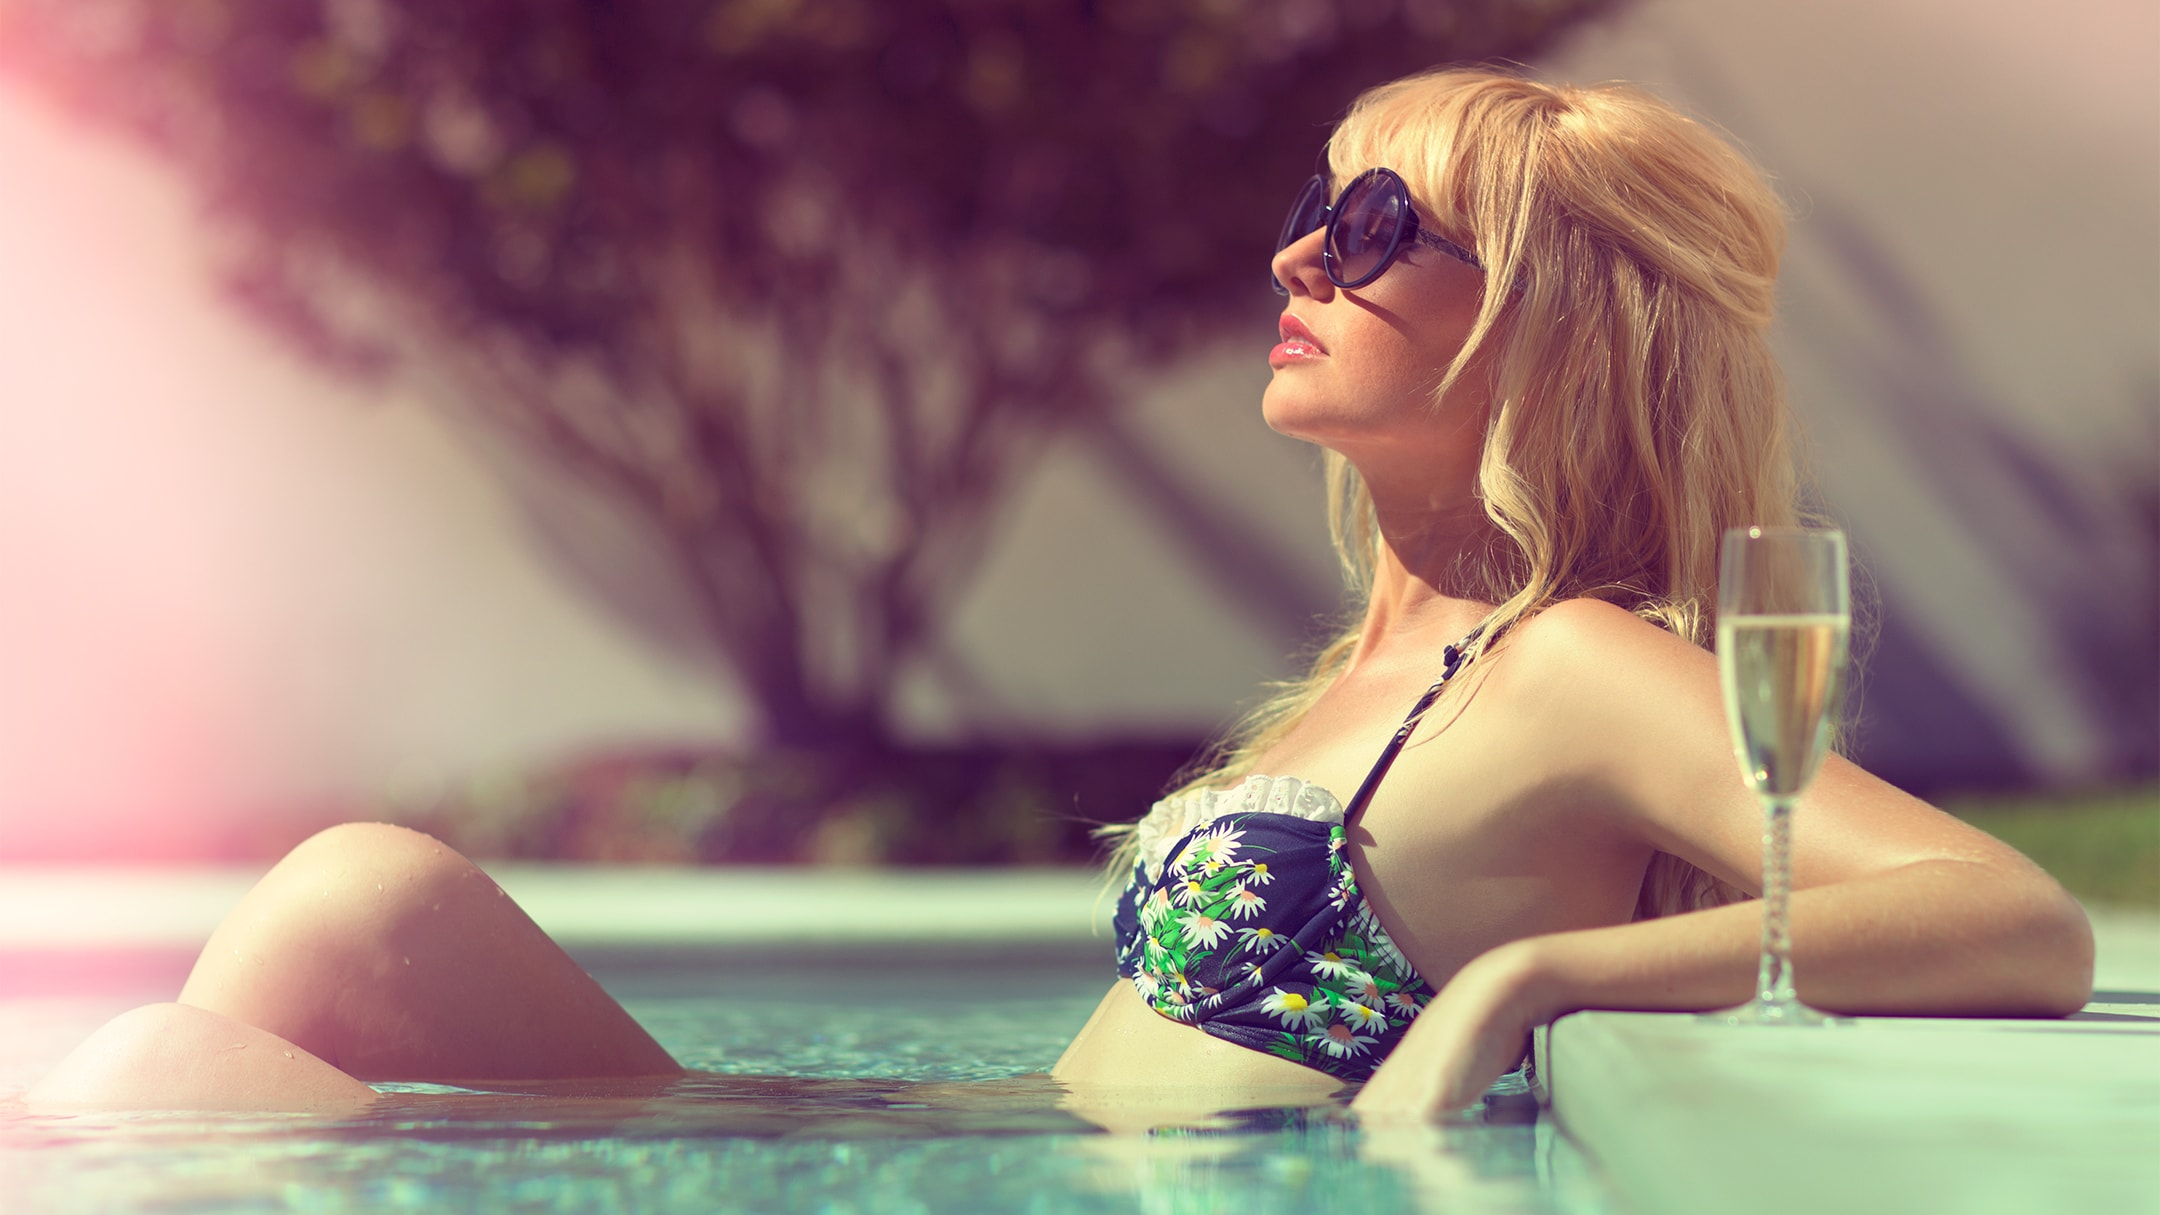 Epicurean Hotel female guest sunbathing